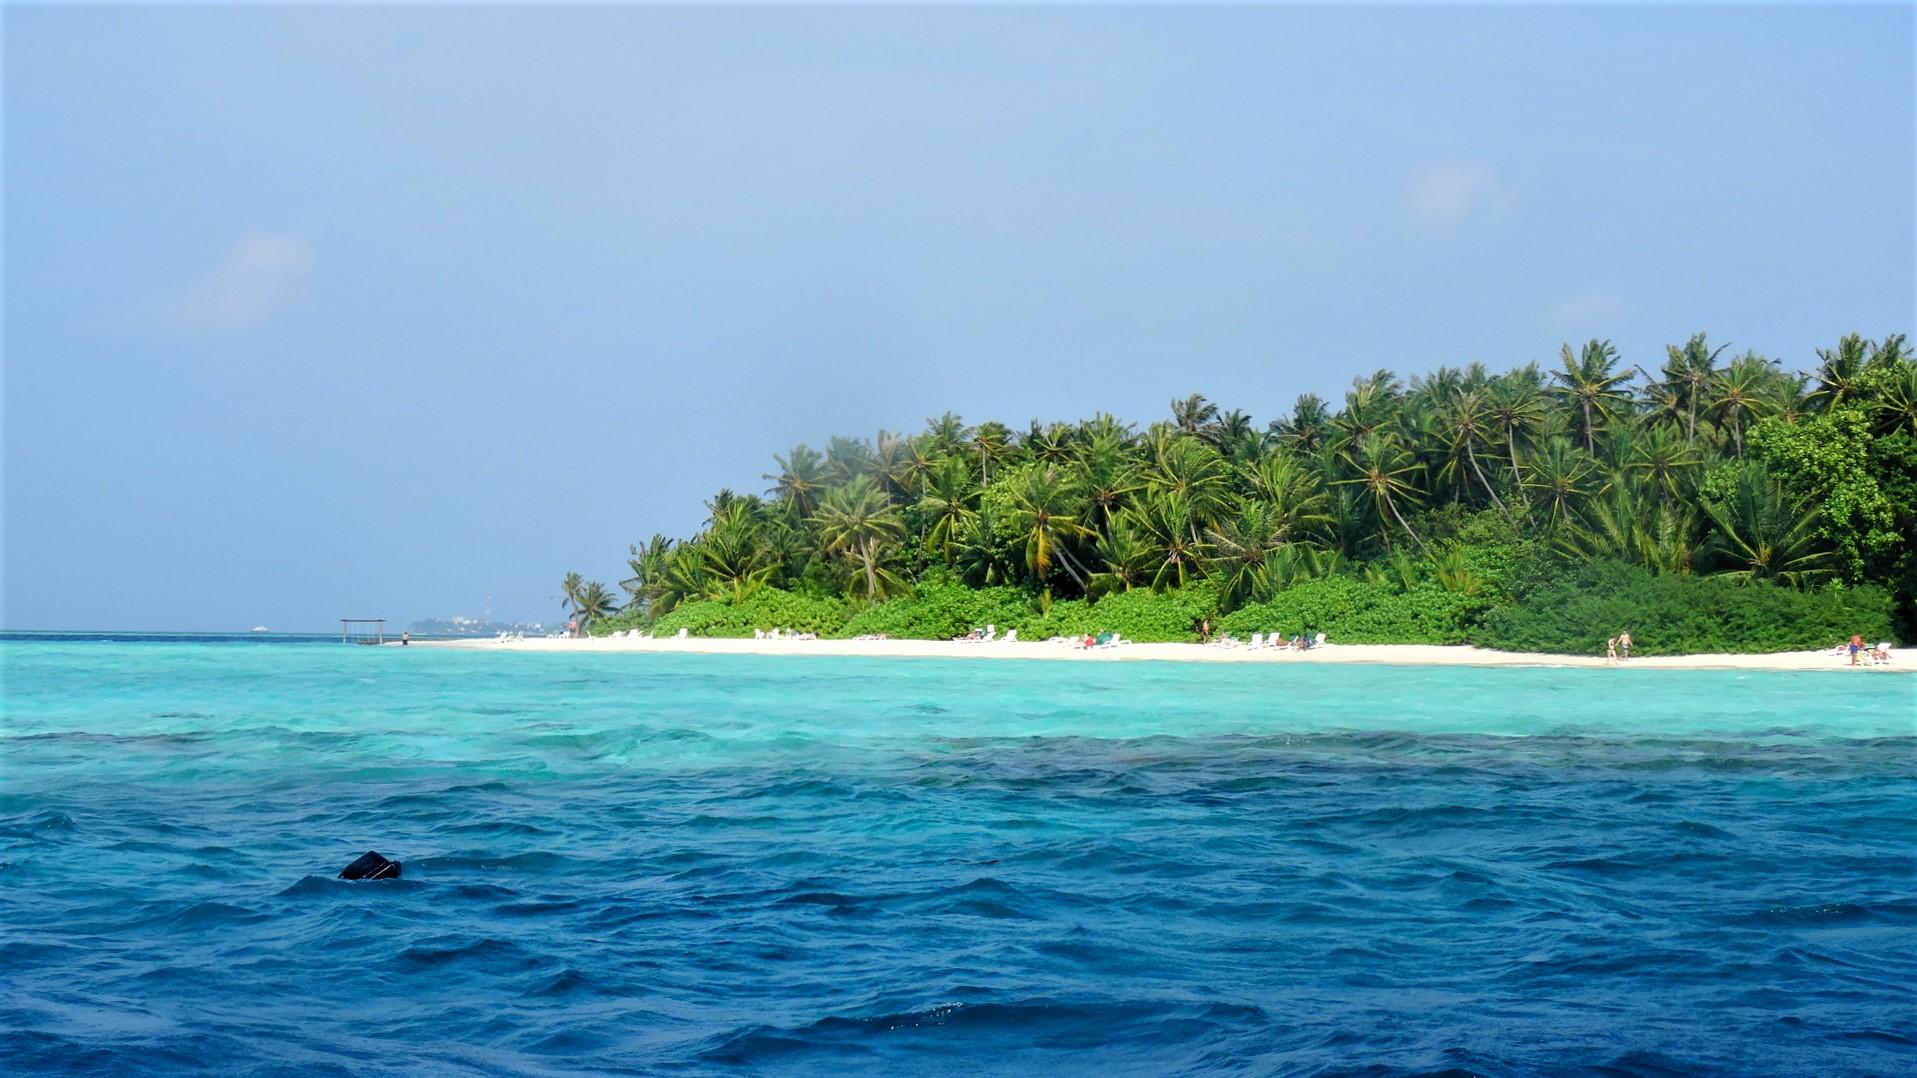 Eiland met strand en palmbomen